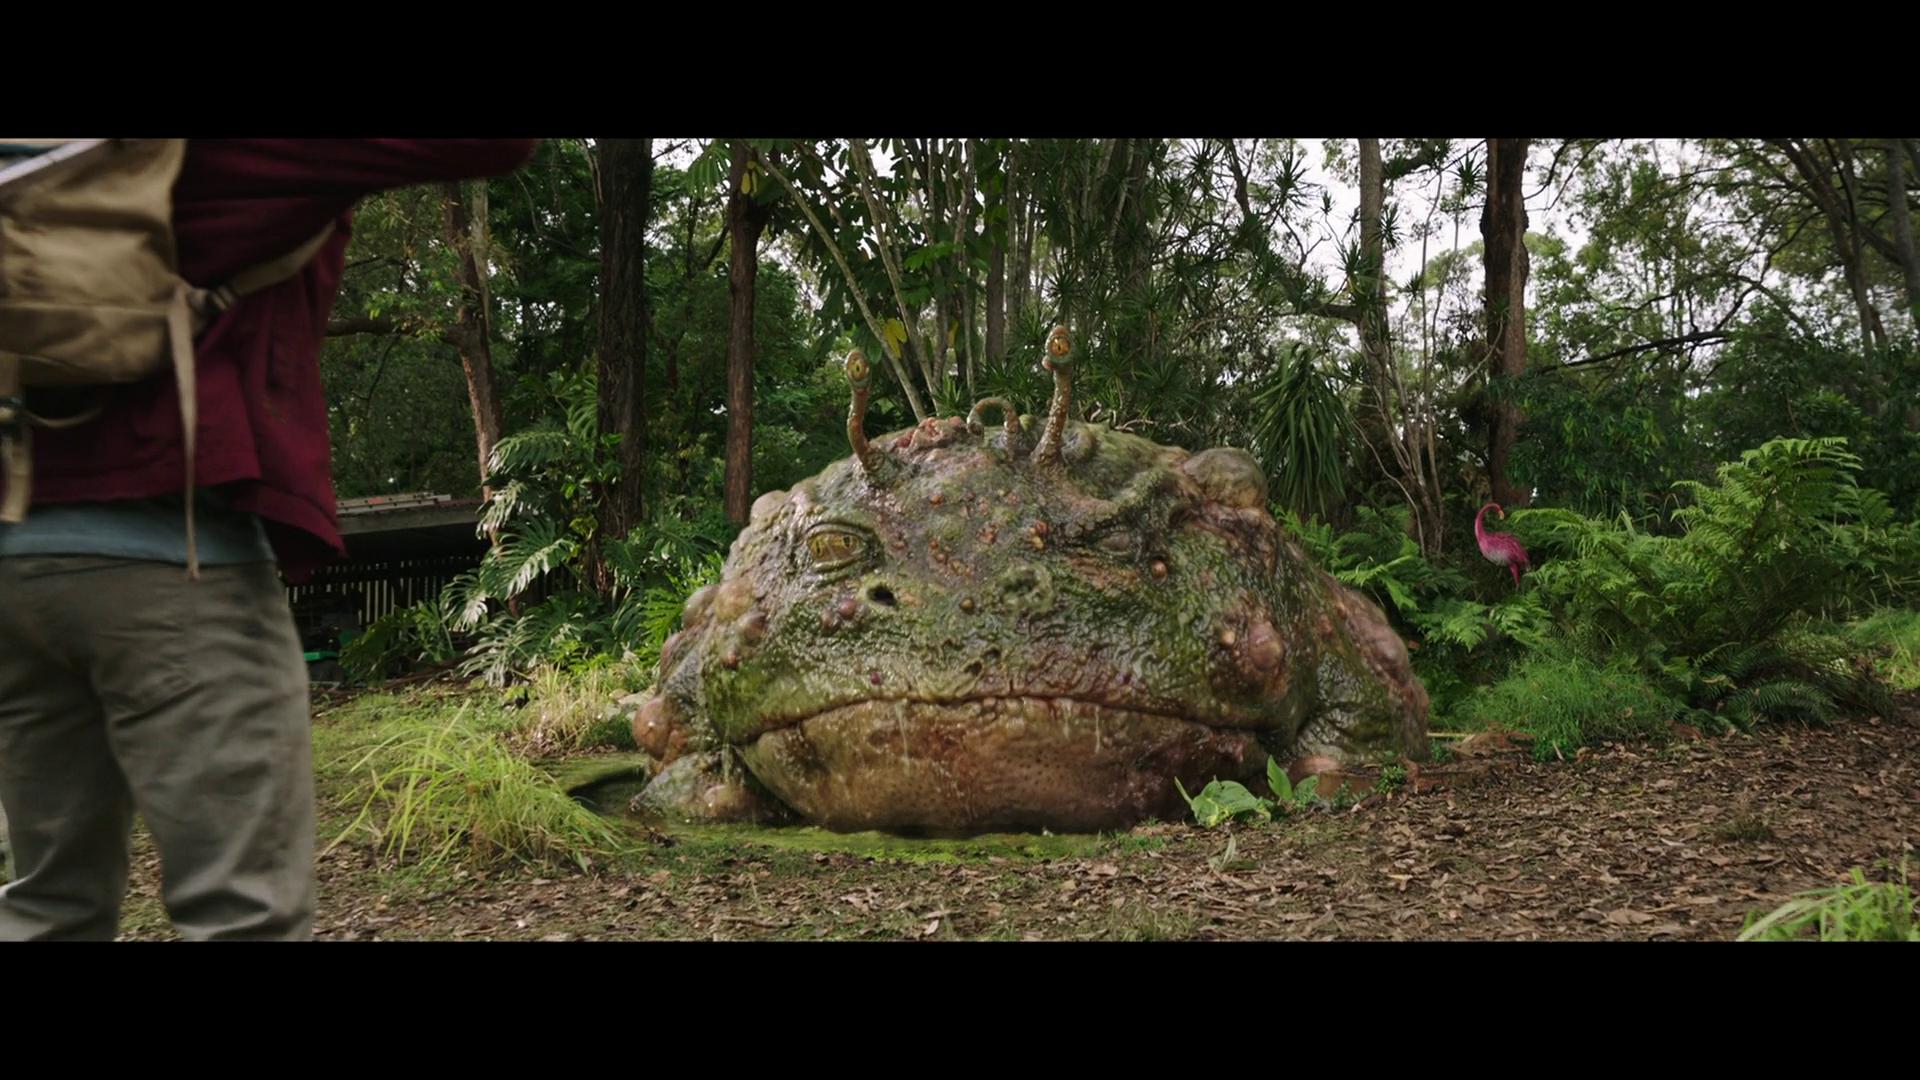 Amor y monstruos (2020) 1080p 60FPS BDrip Latino